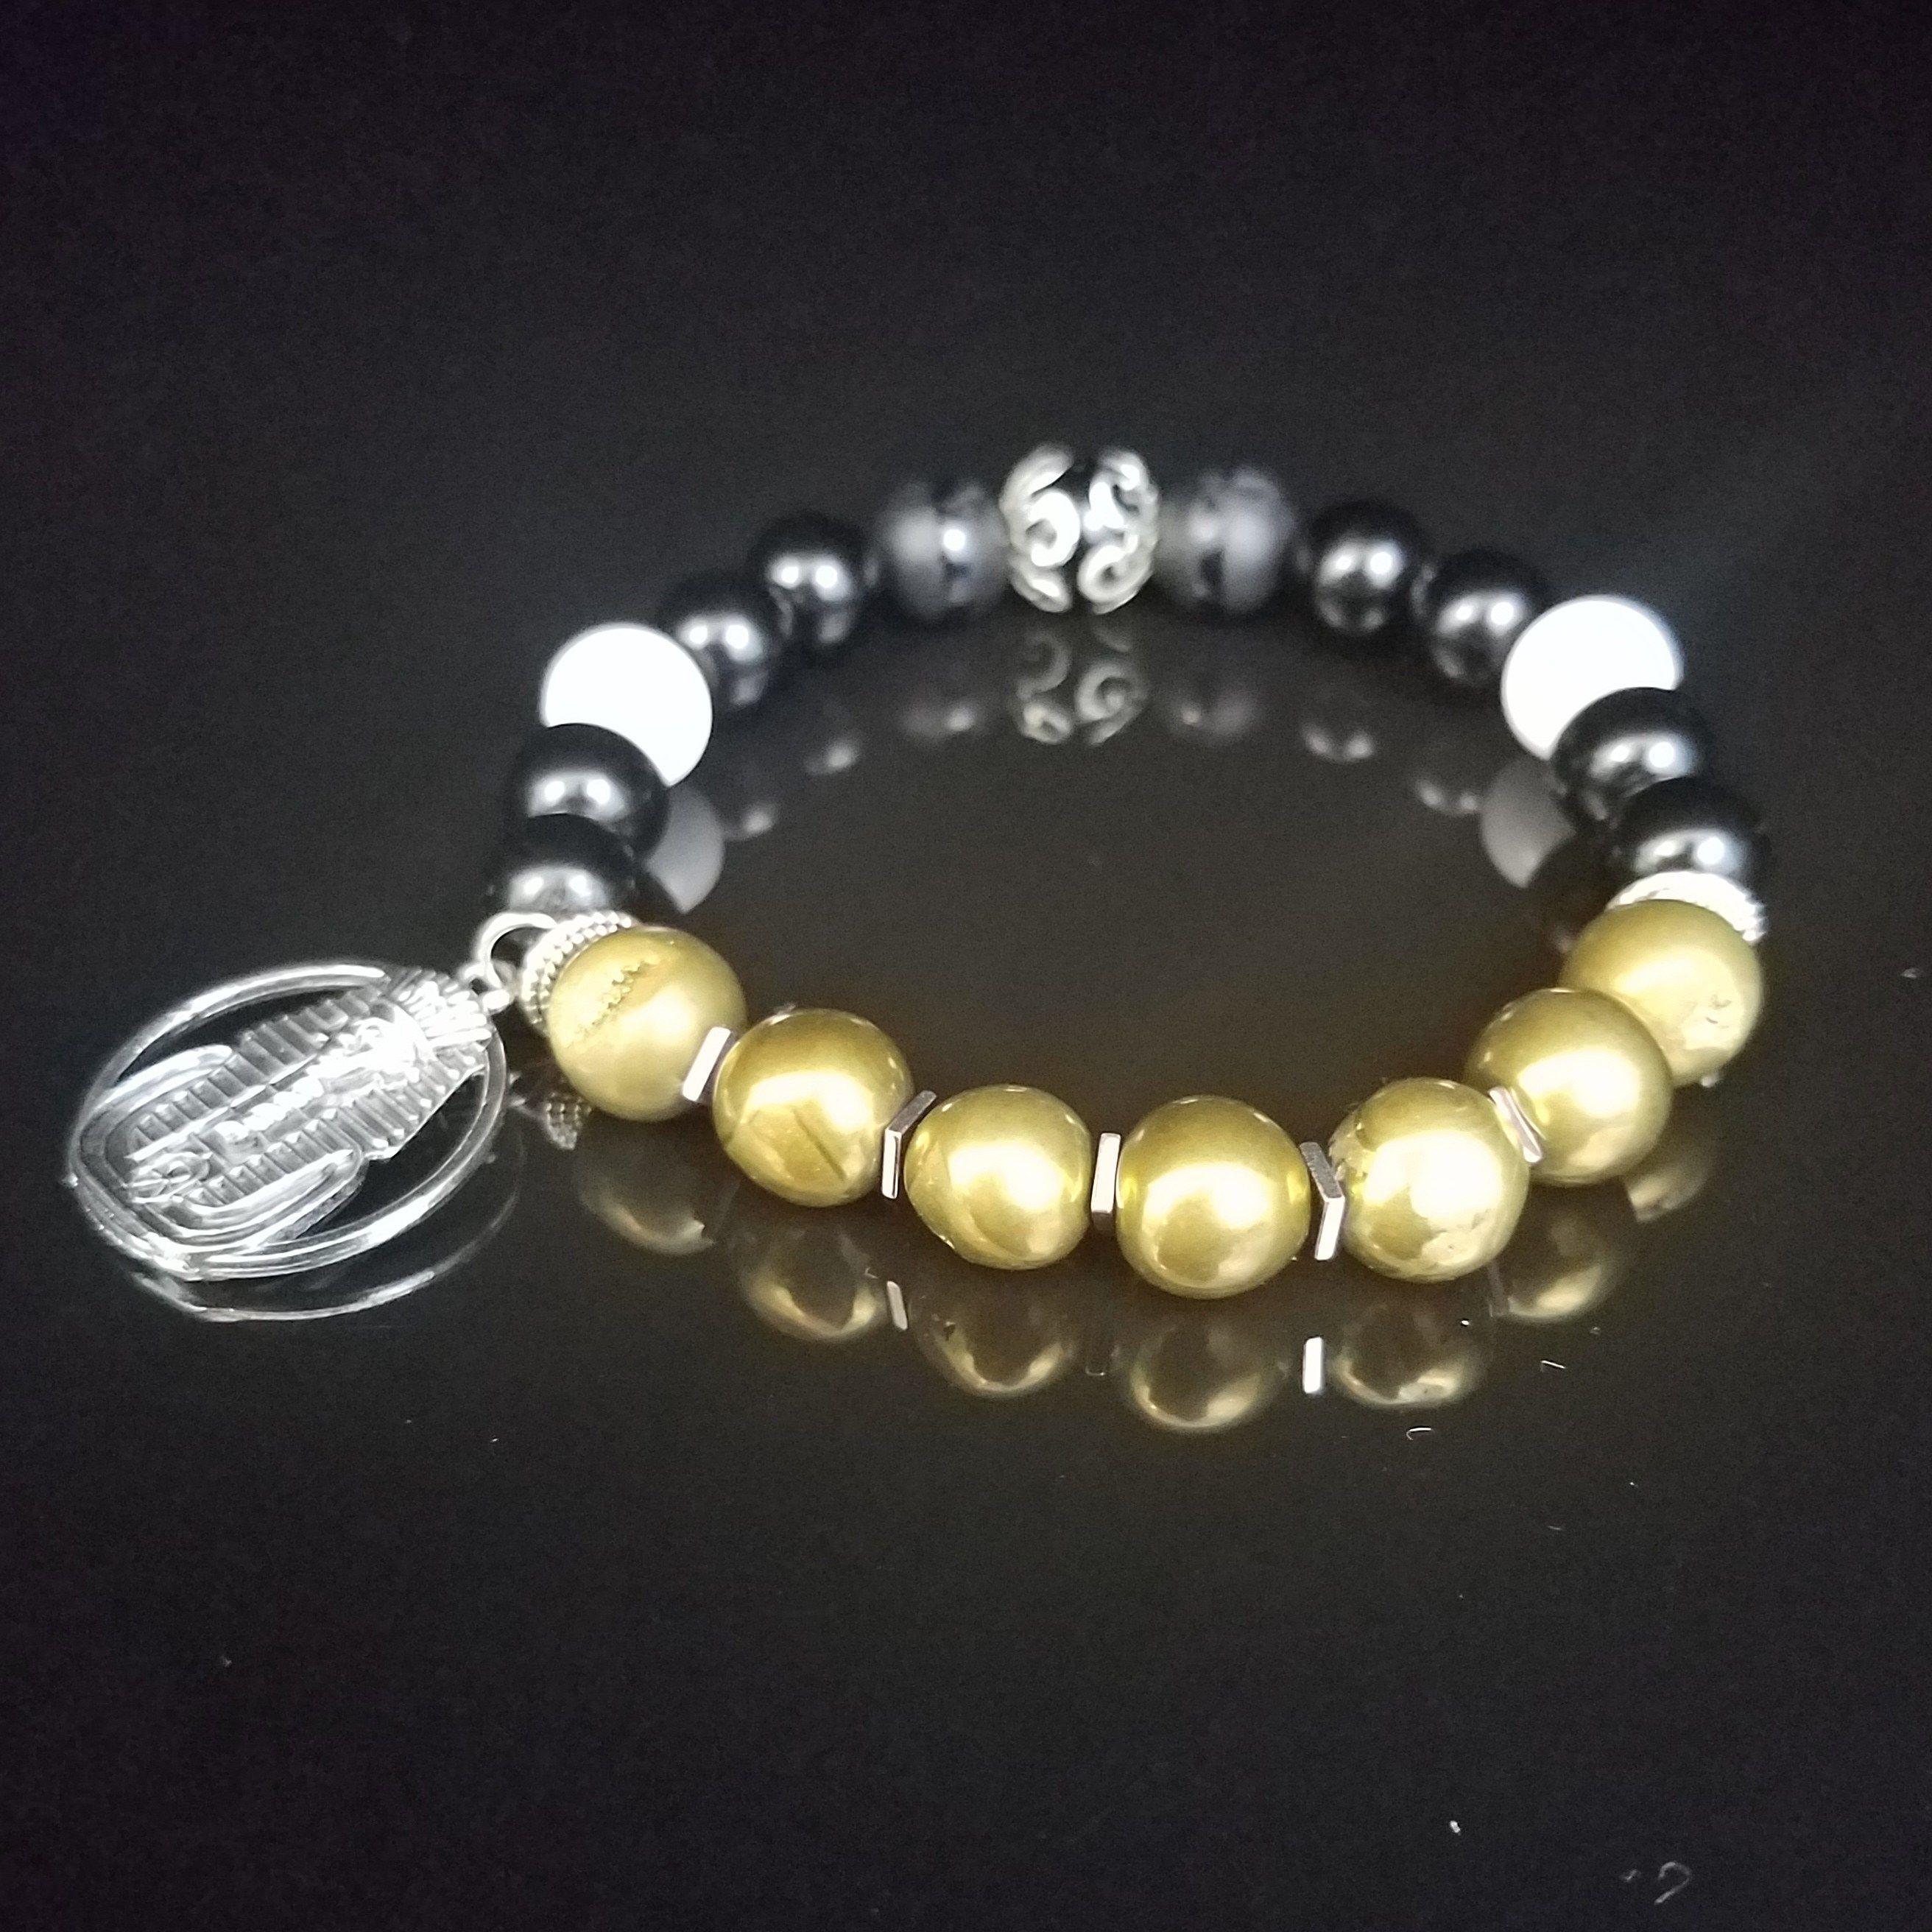 859747317cd This stunning Men s Beaded Bracelet is in honor of Alpha Phi Alpha  Fraternity